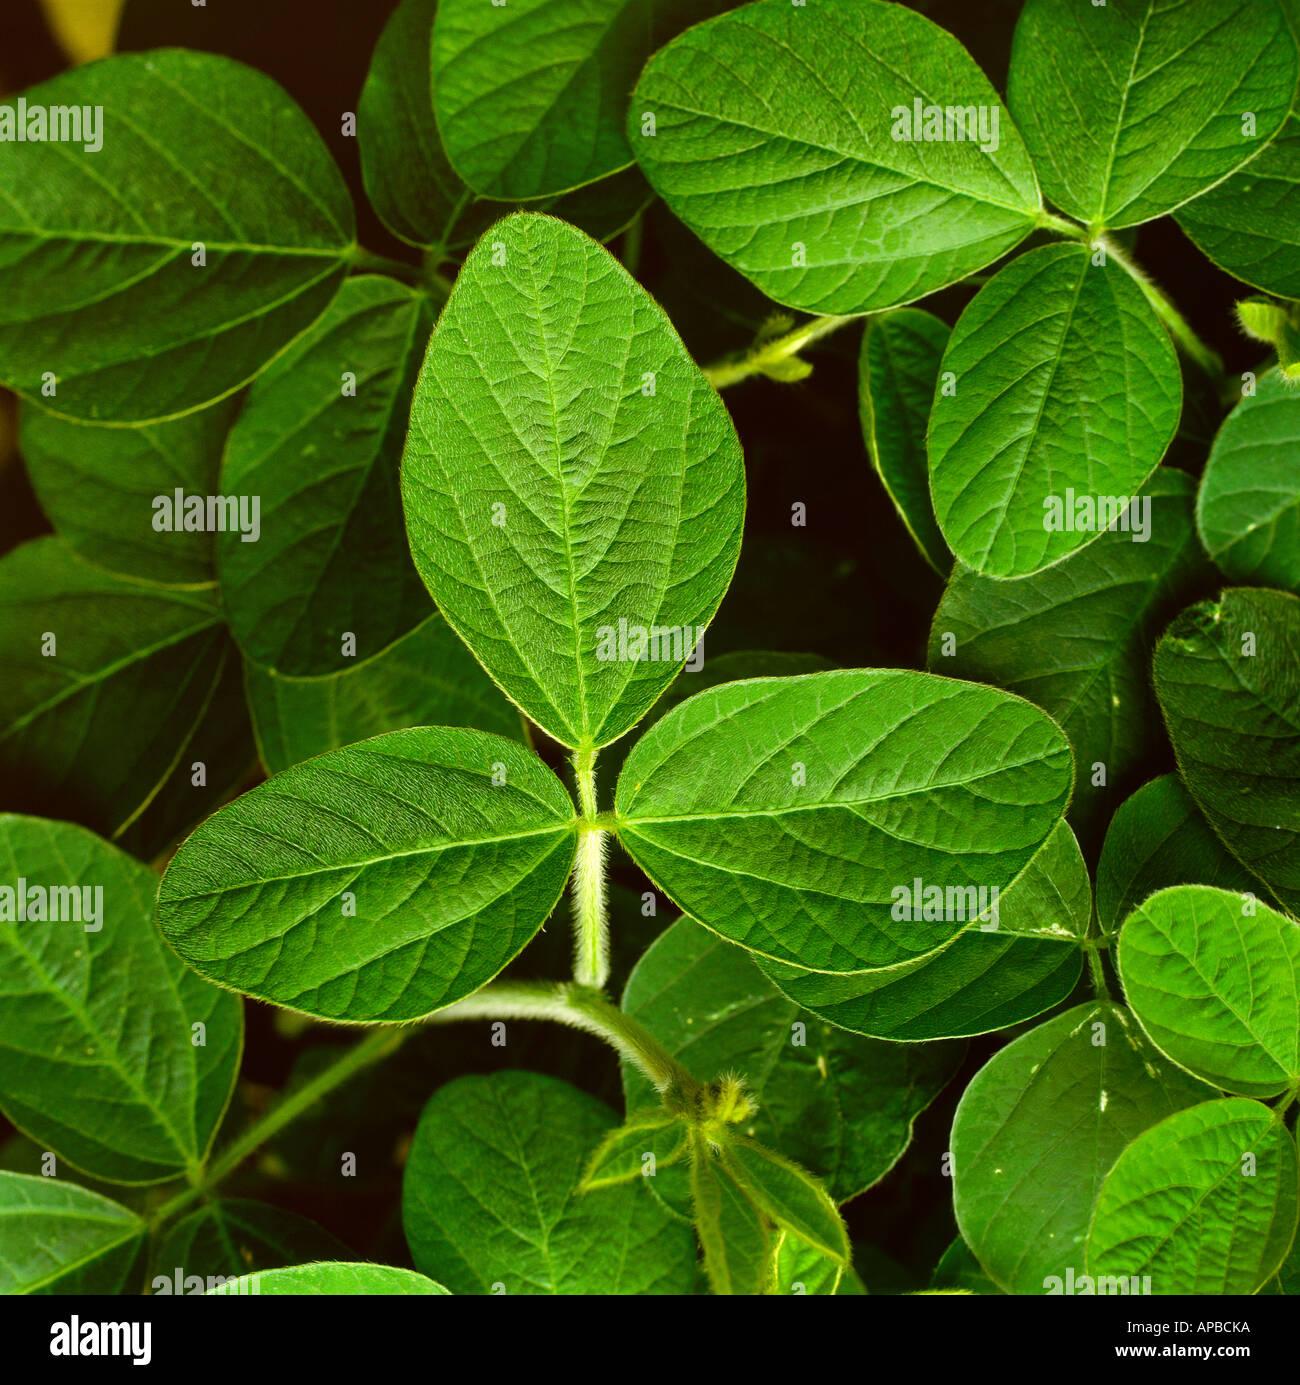 soybean plant stock photos soybean plant stock images alamy